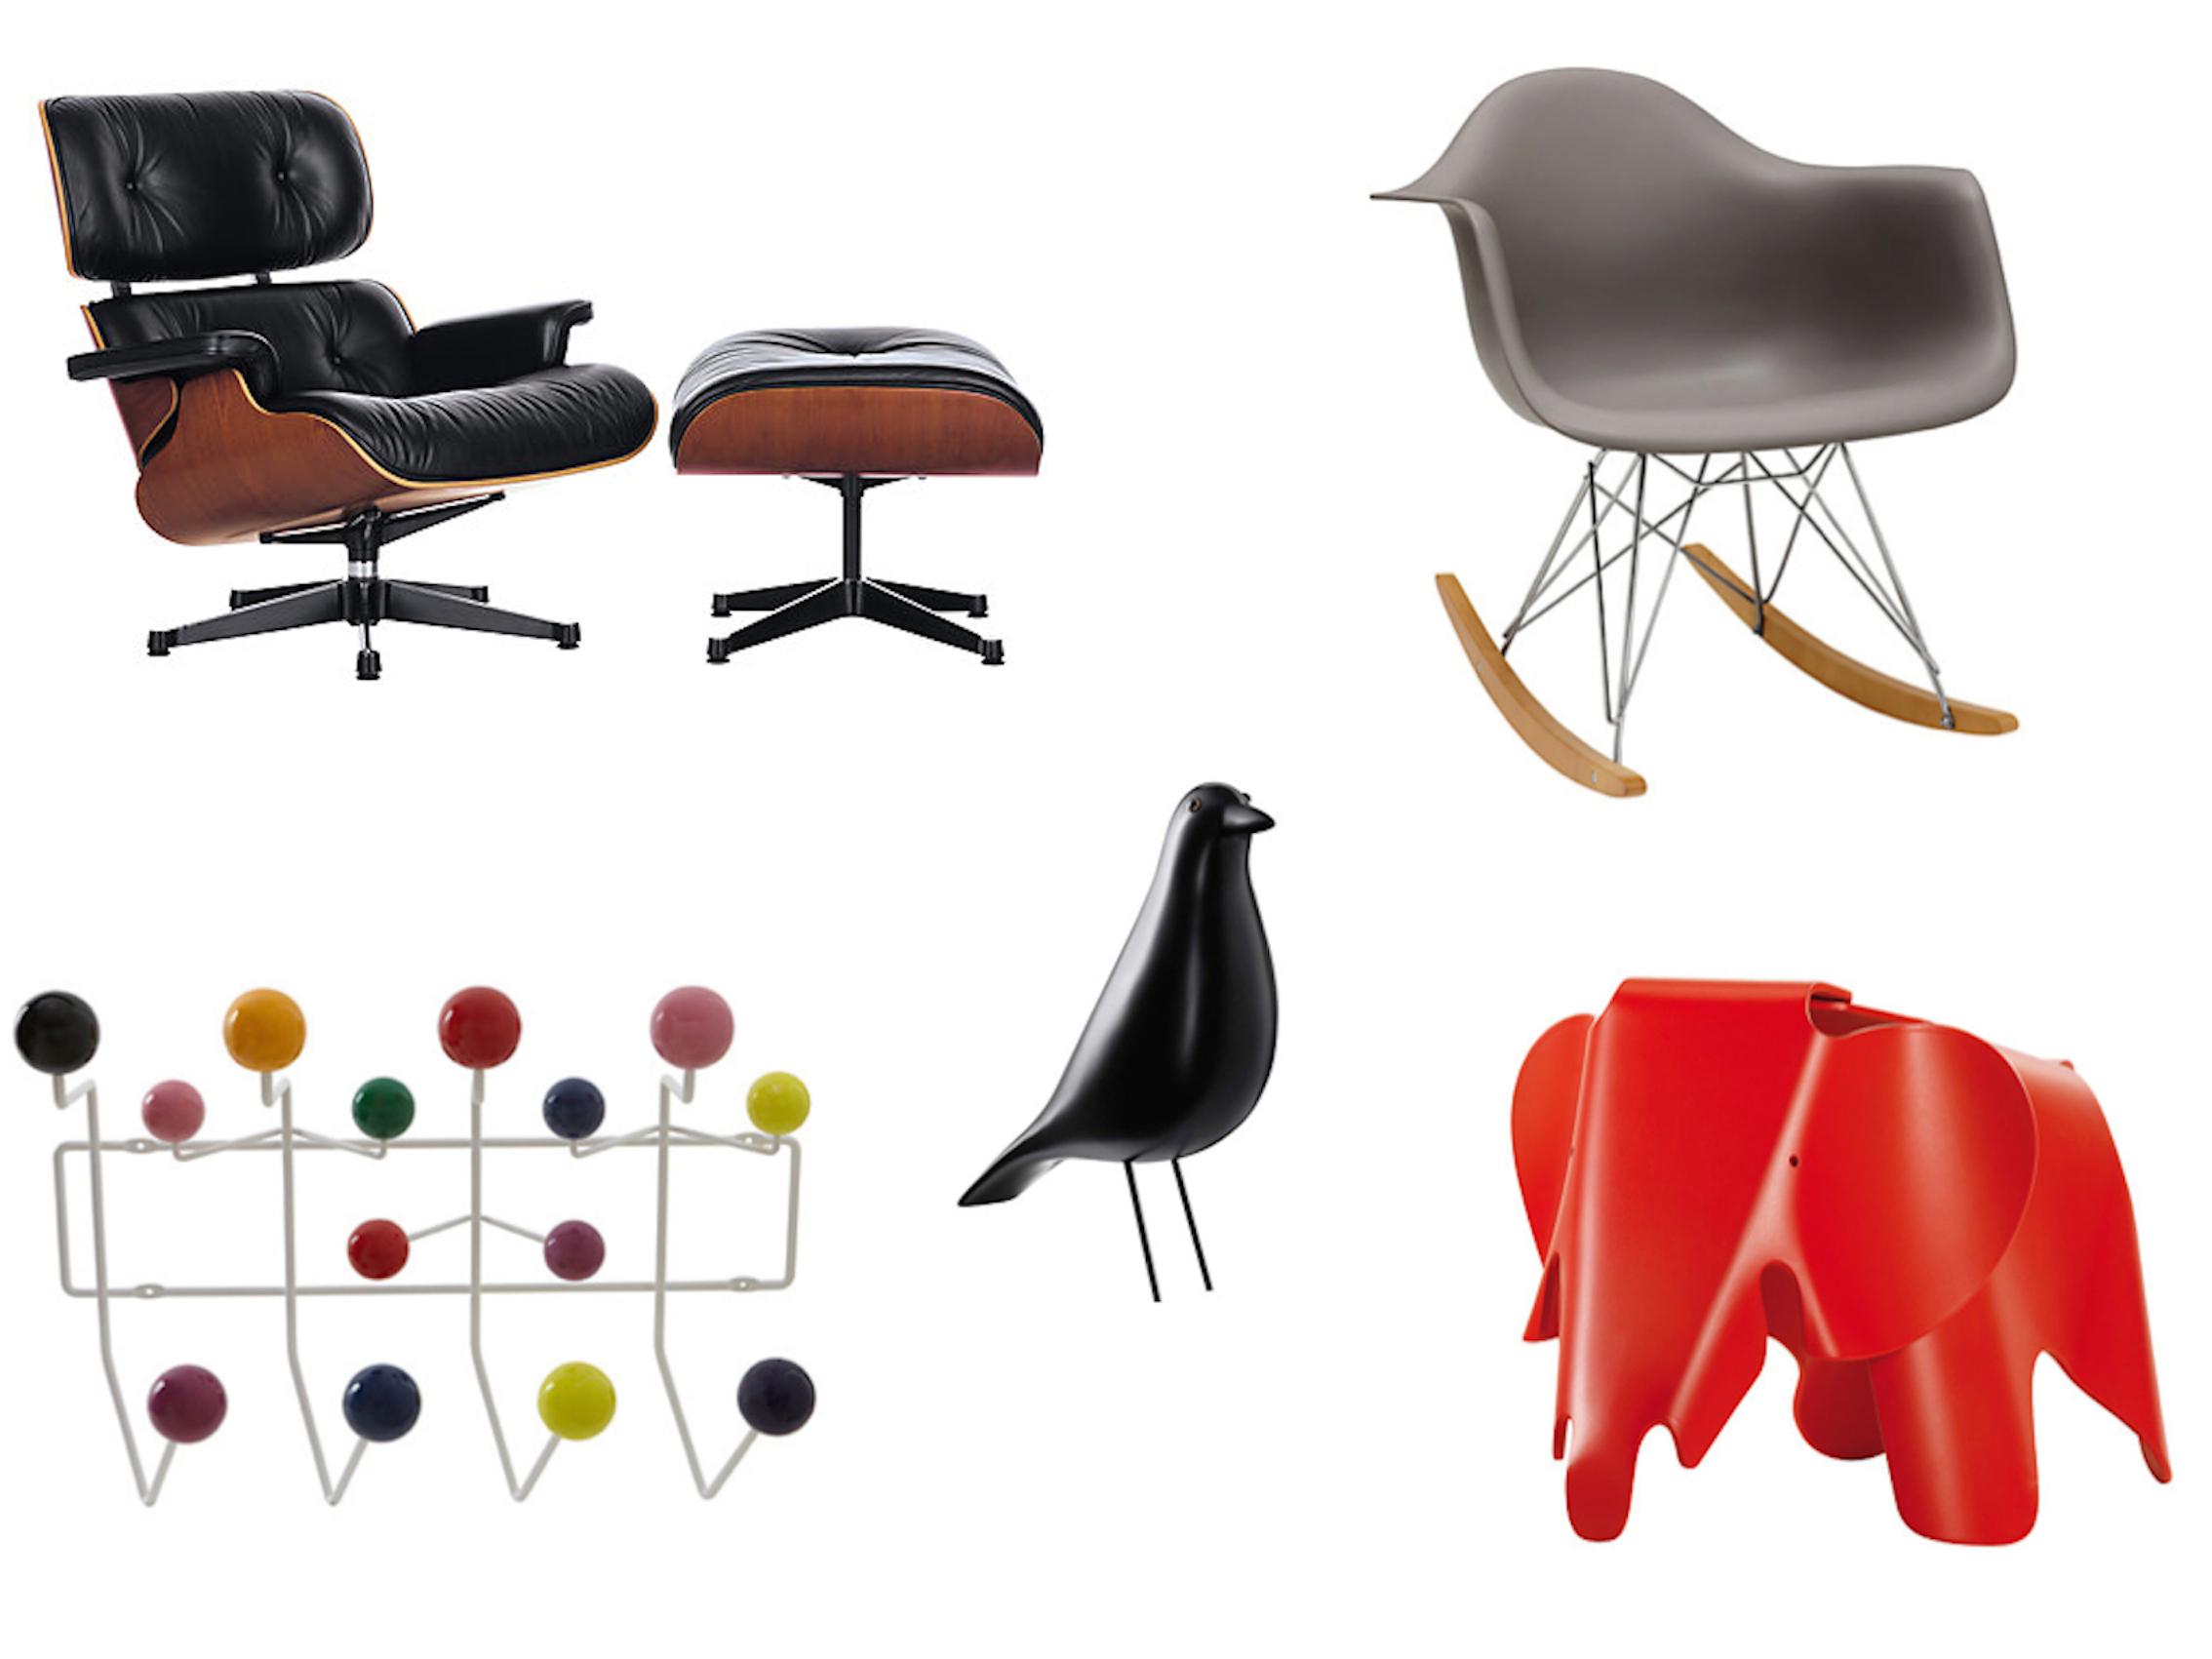 design heroes charles ray eames room pr. Black Bedroom Furniture Sets. Home Design Ideas